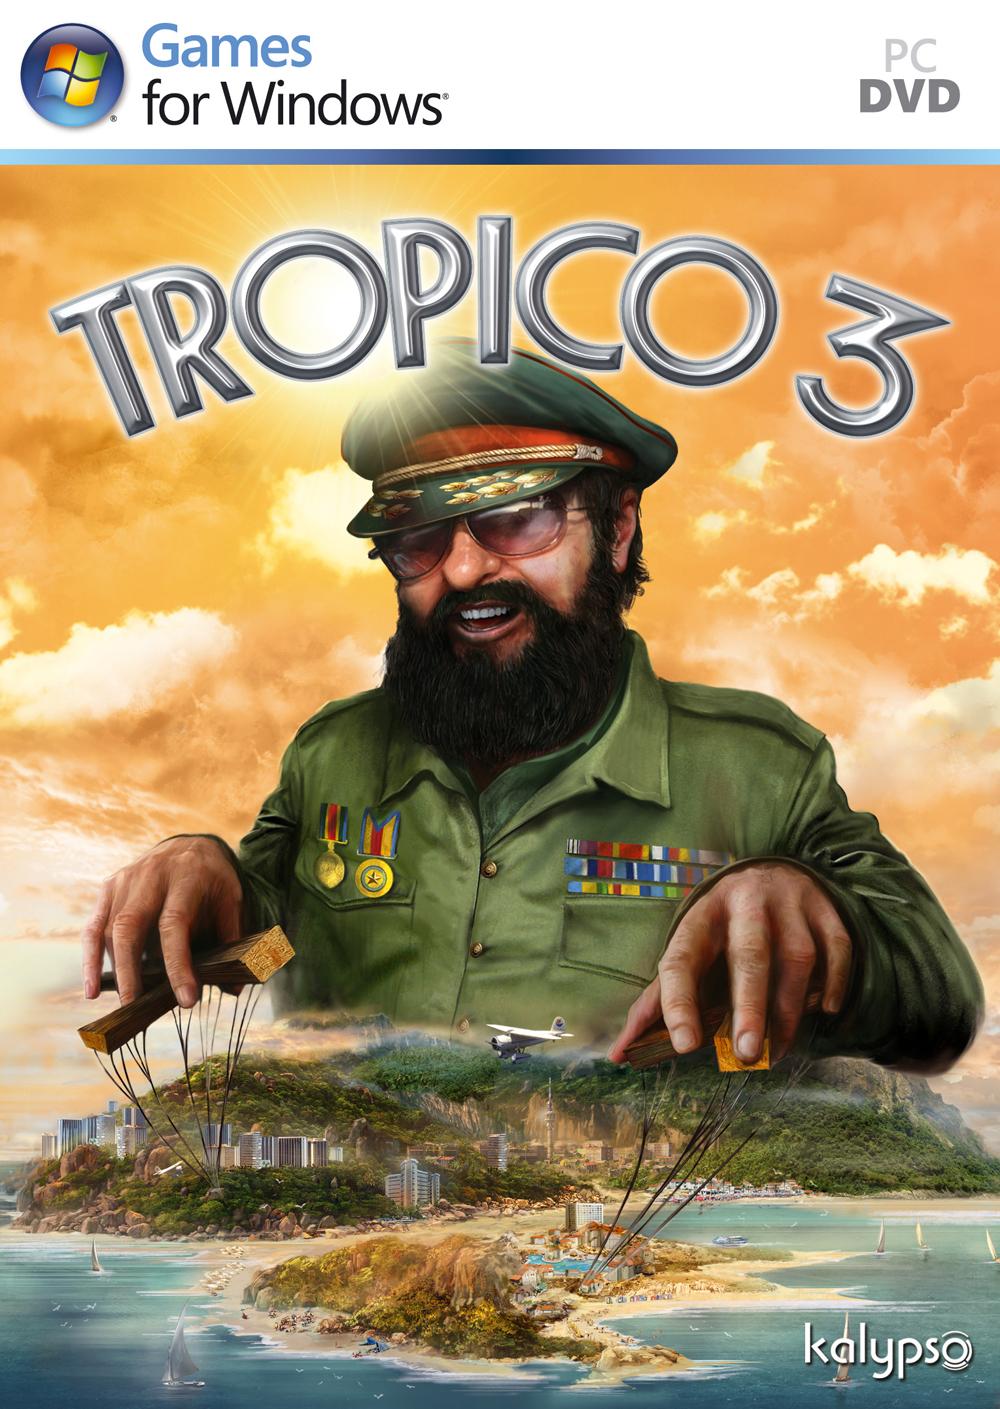 Tropico Pics, Video Game Collection